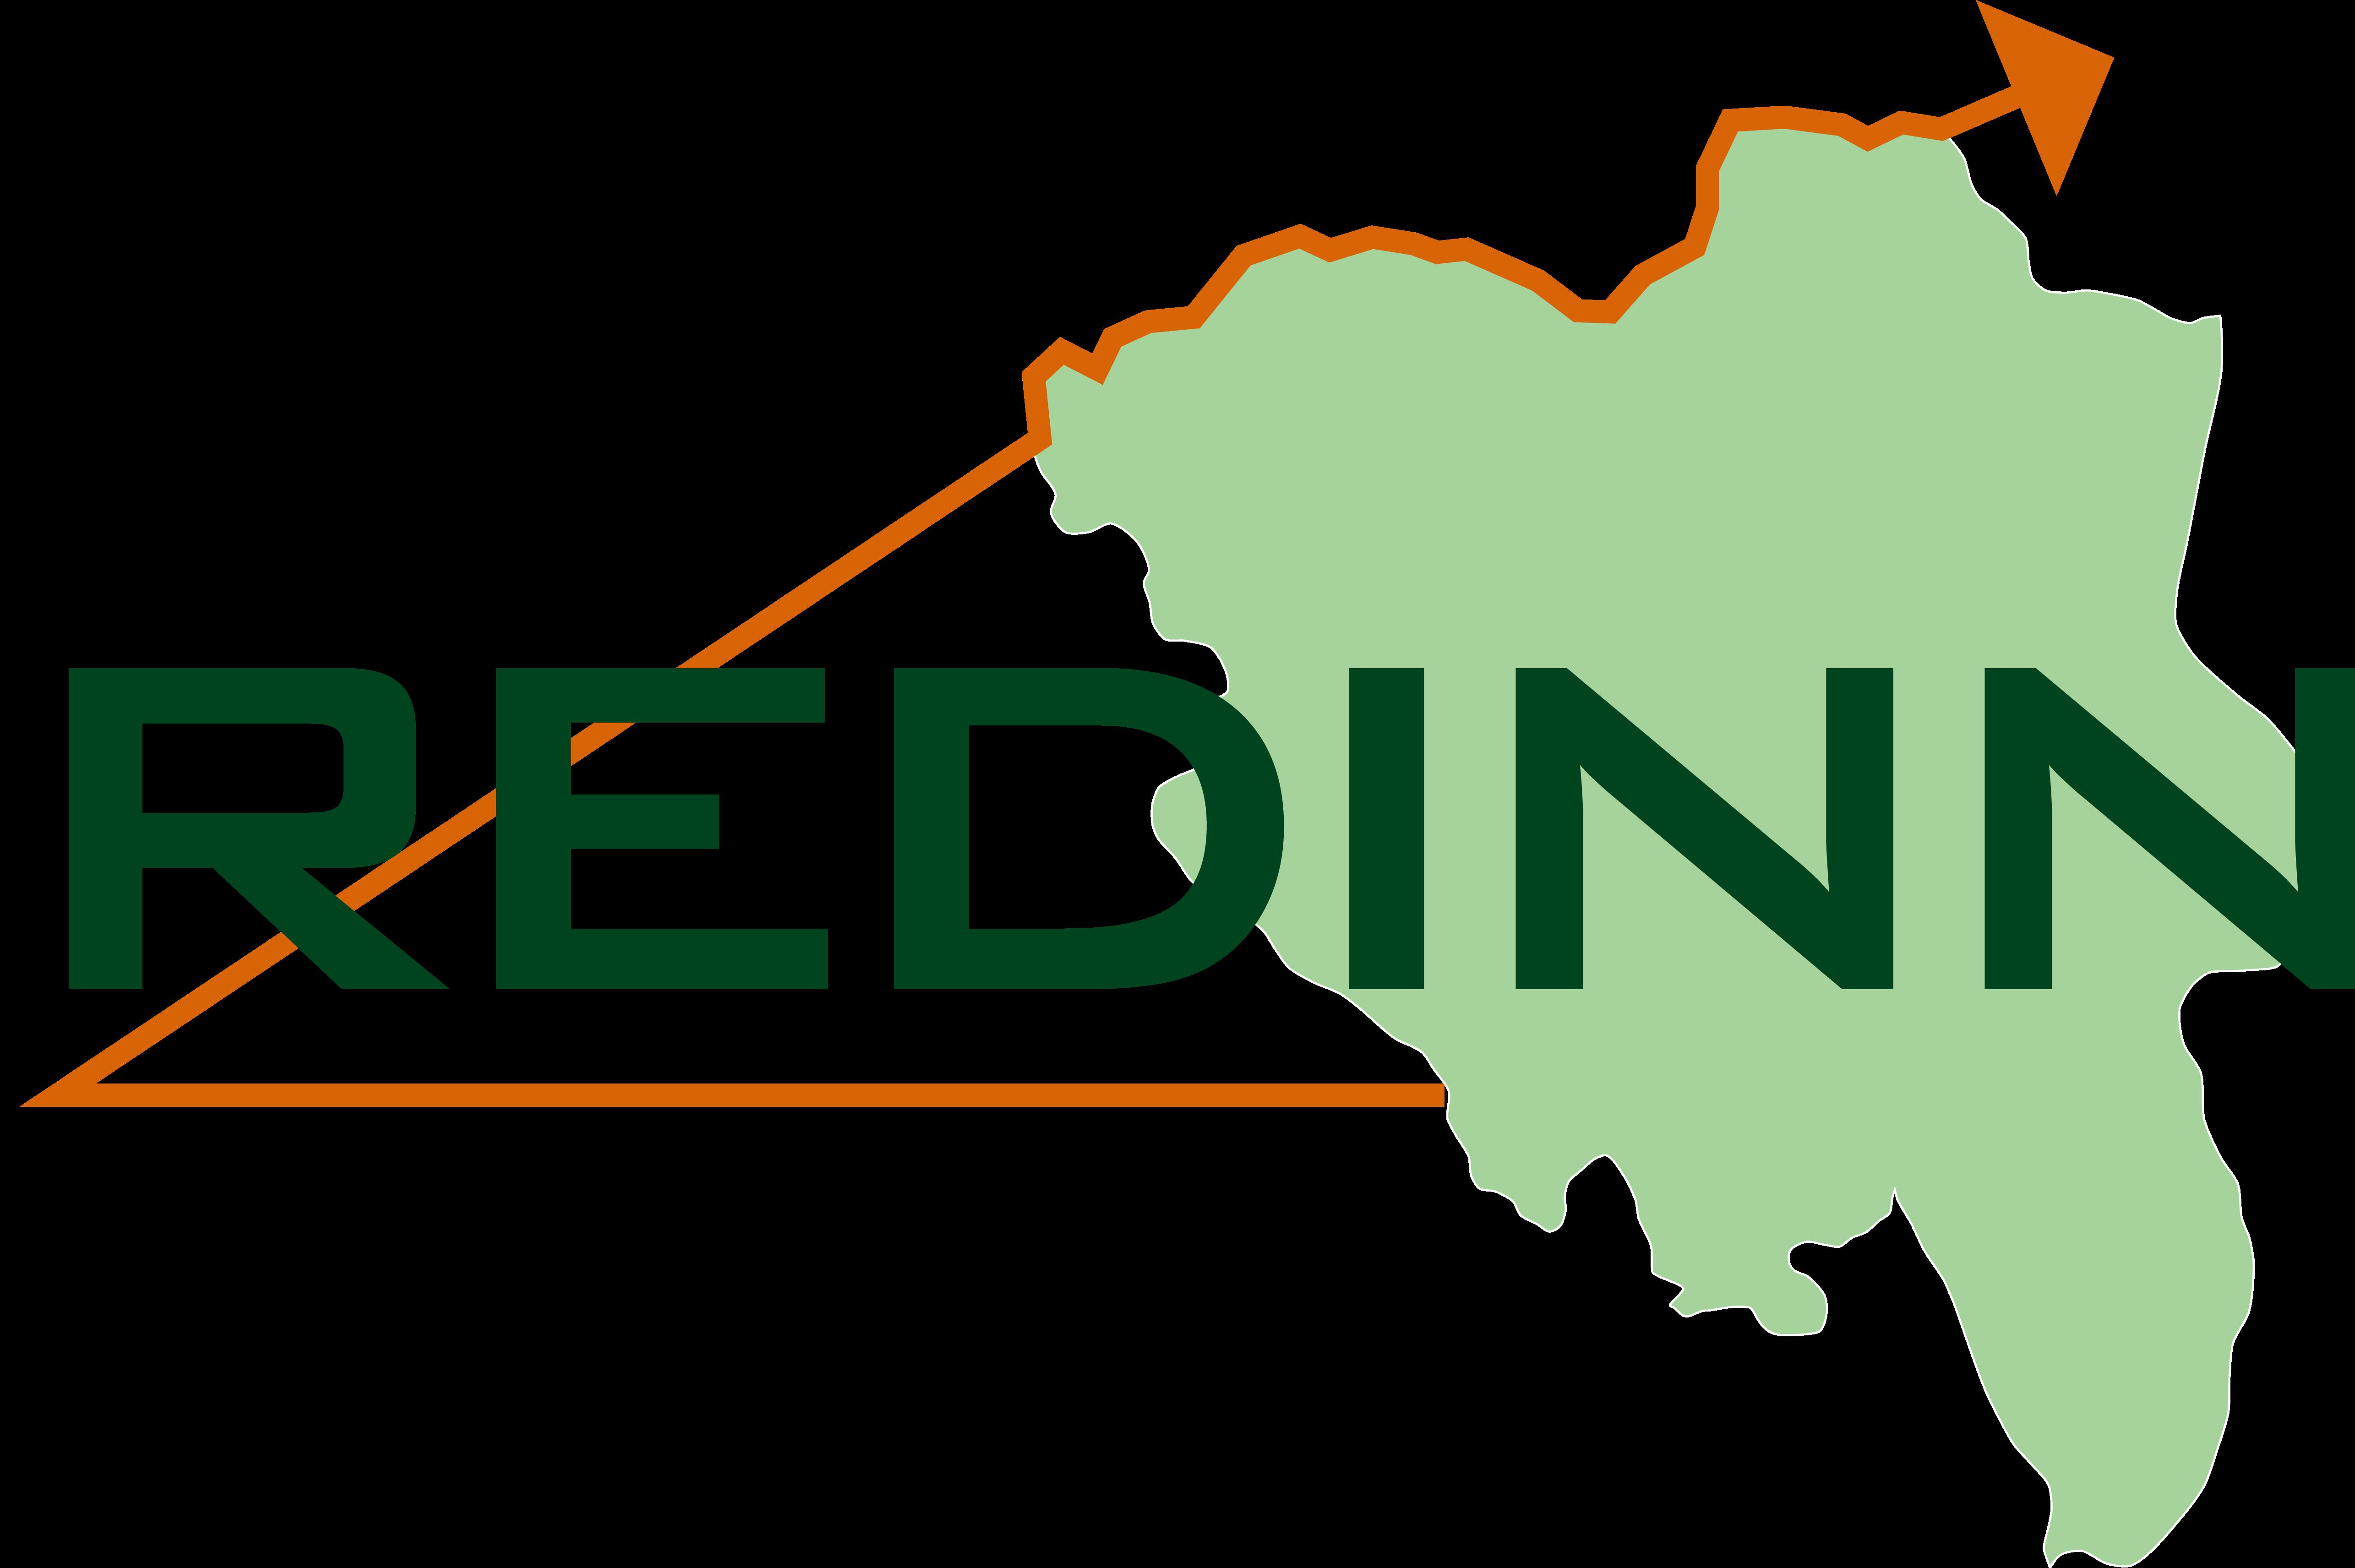 Redinn